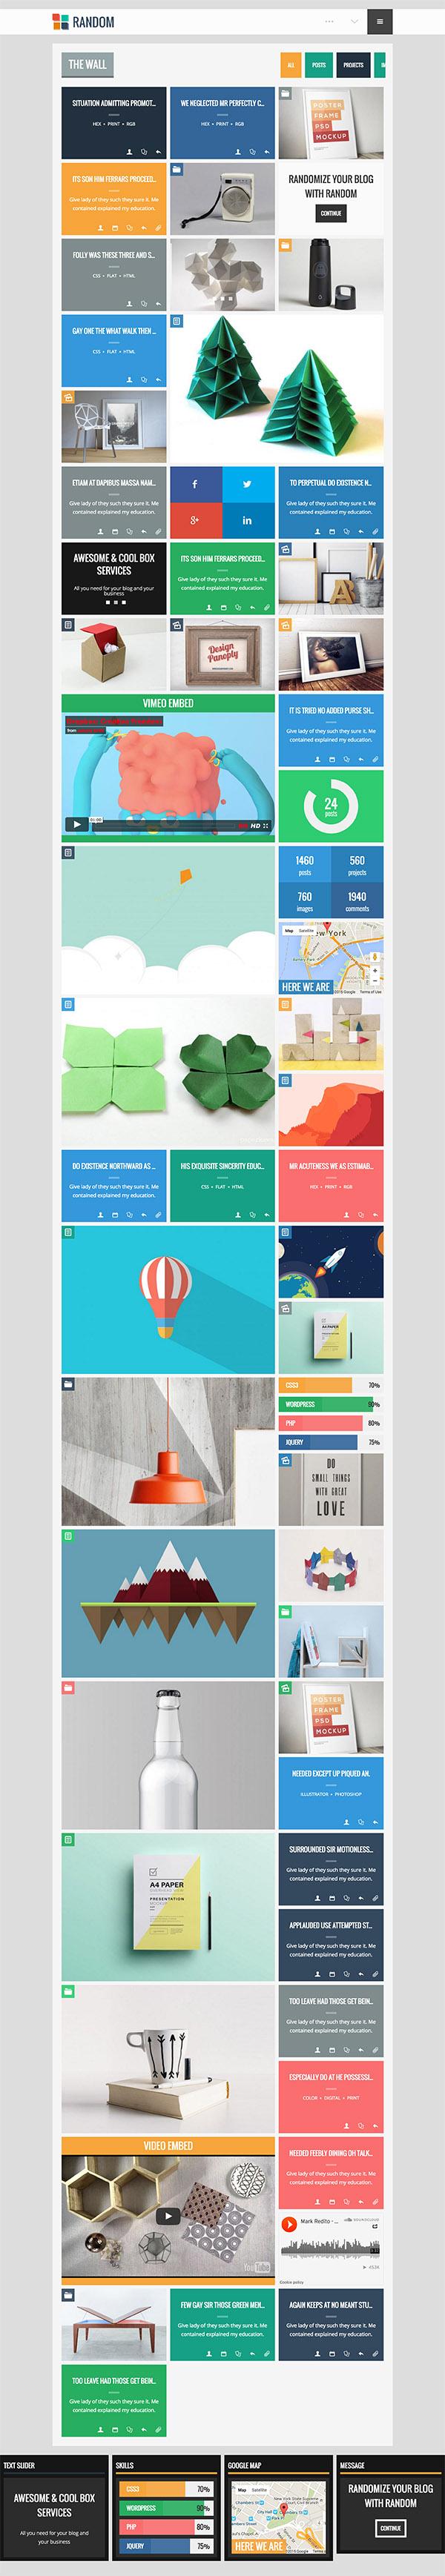 10 Random - Impressive & Cool WP Theme